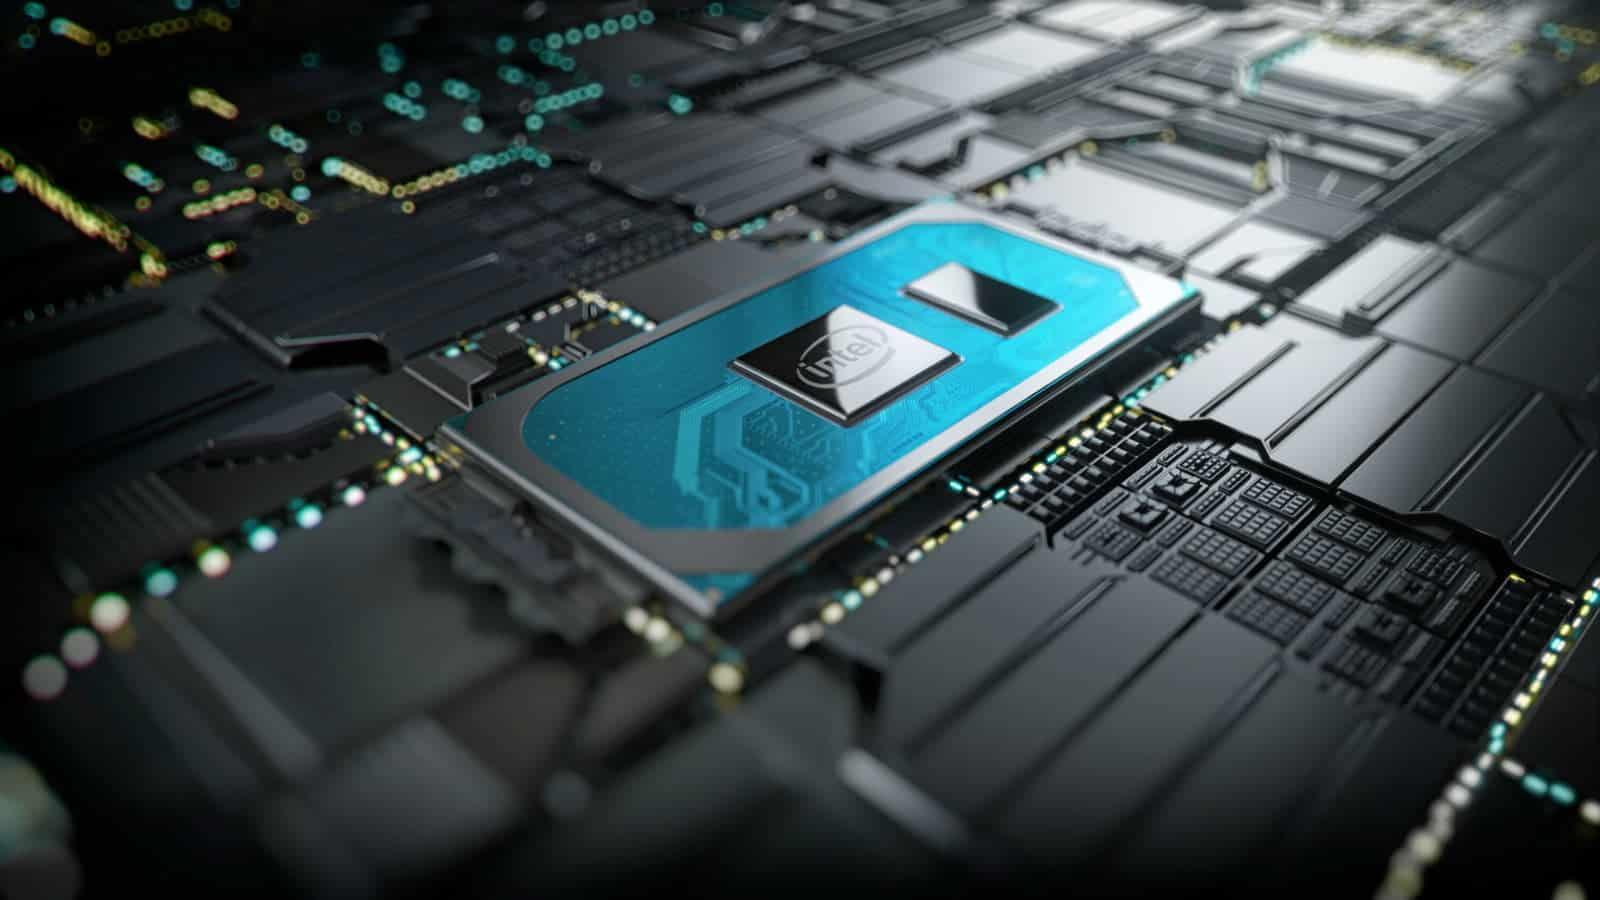 Competitors to AMD Ryzen 9 5900HX desktop processors!